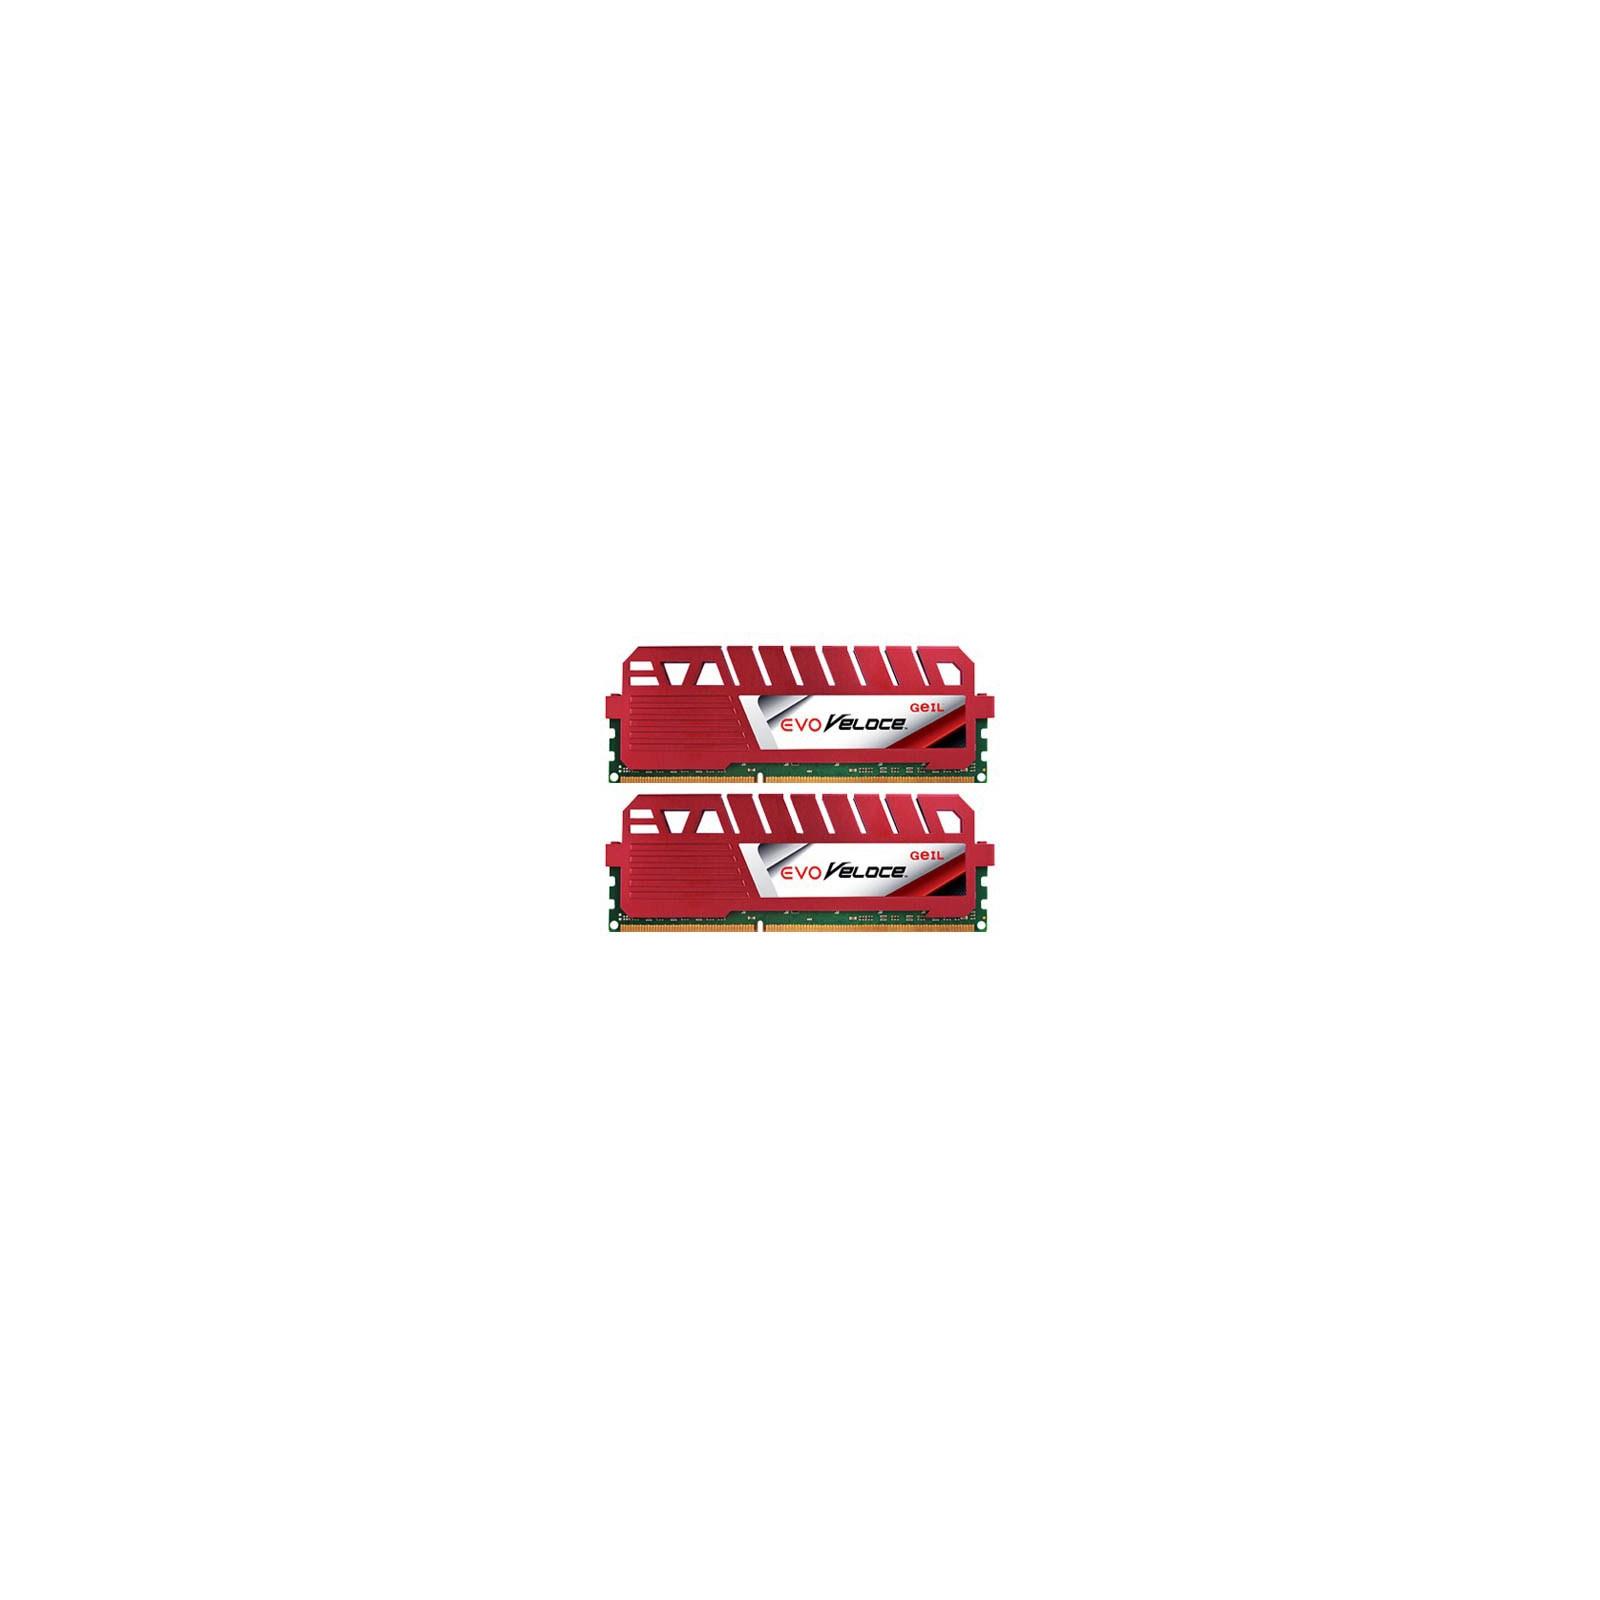 Модуль памяти для компьютера DDR3 16GB (4x4GB) 1600 MHz GEIL (GEV316GB1600C9QC)